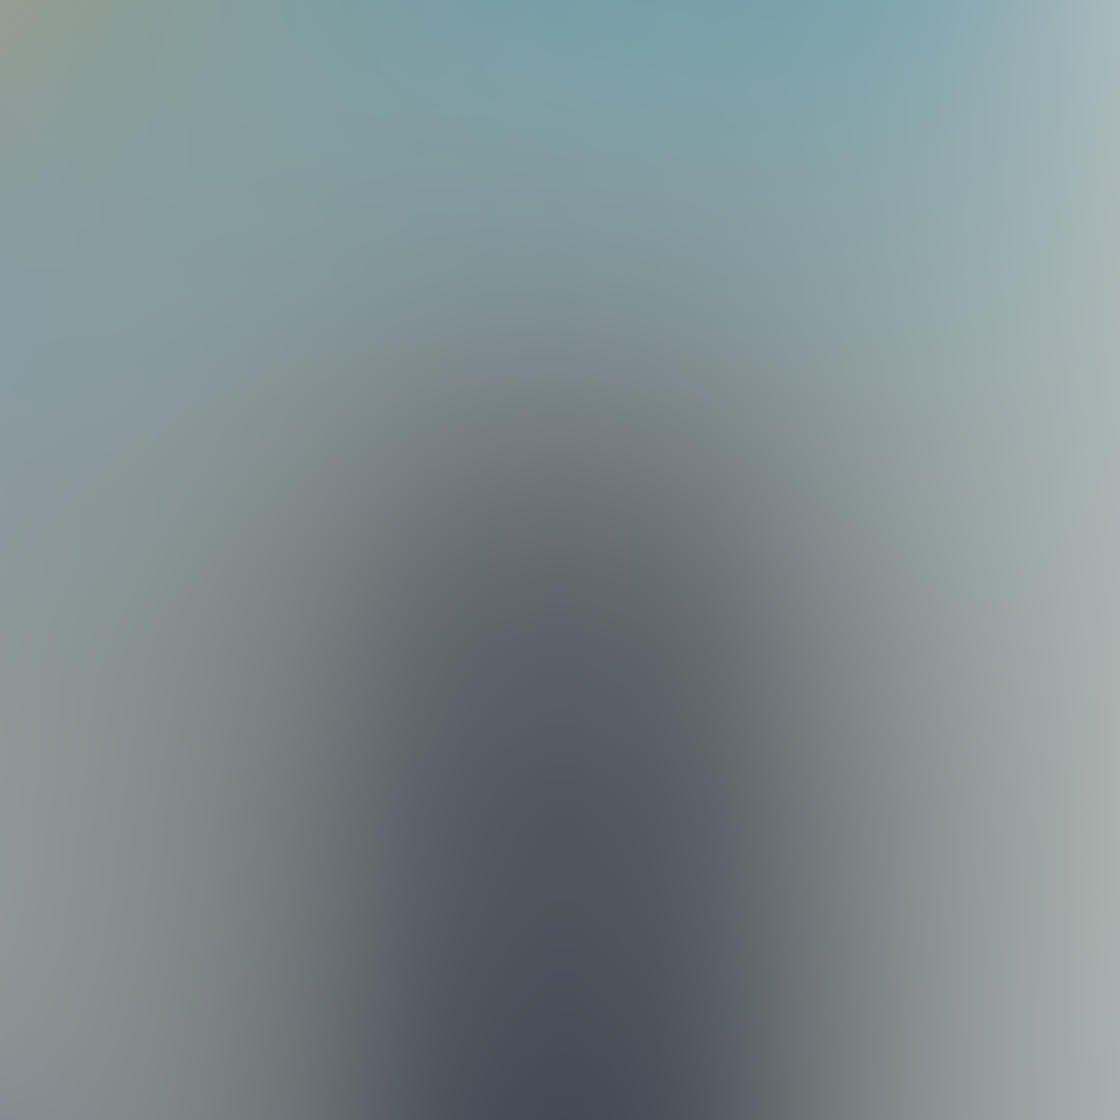 iPhone Burst Mode